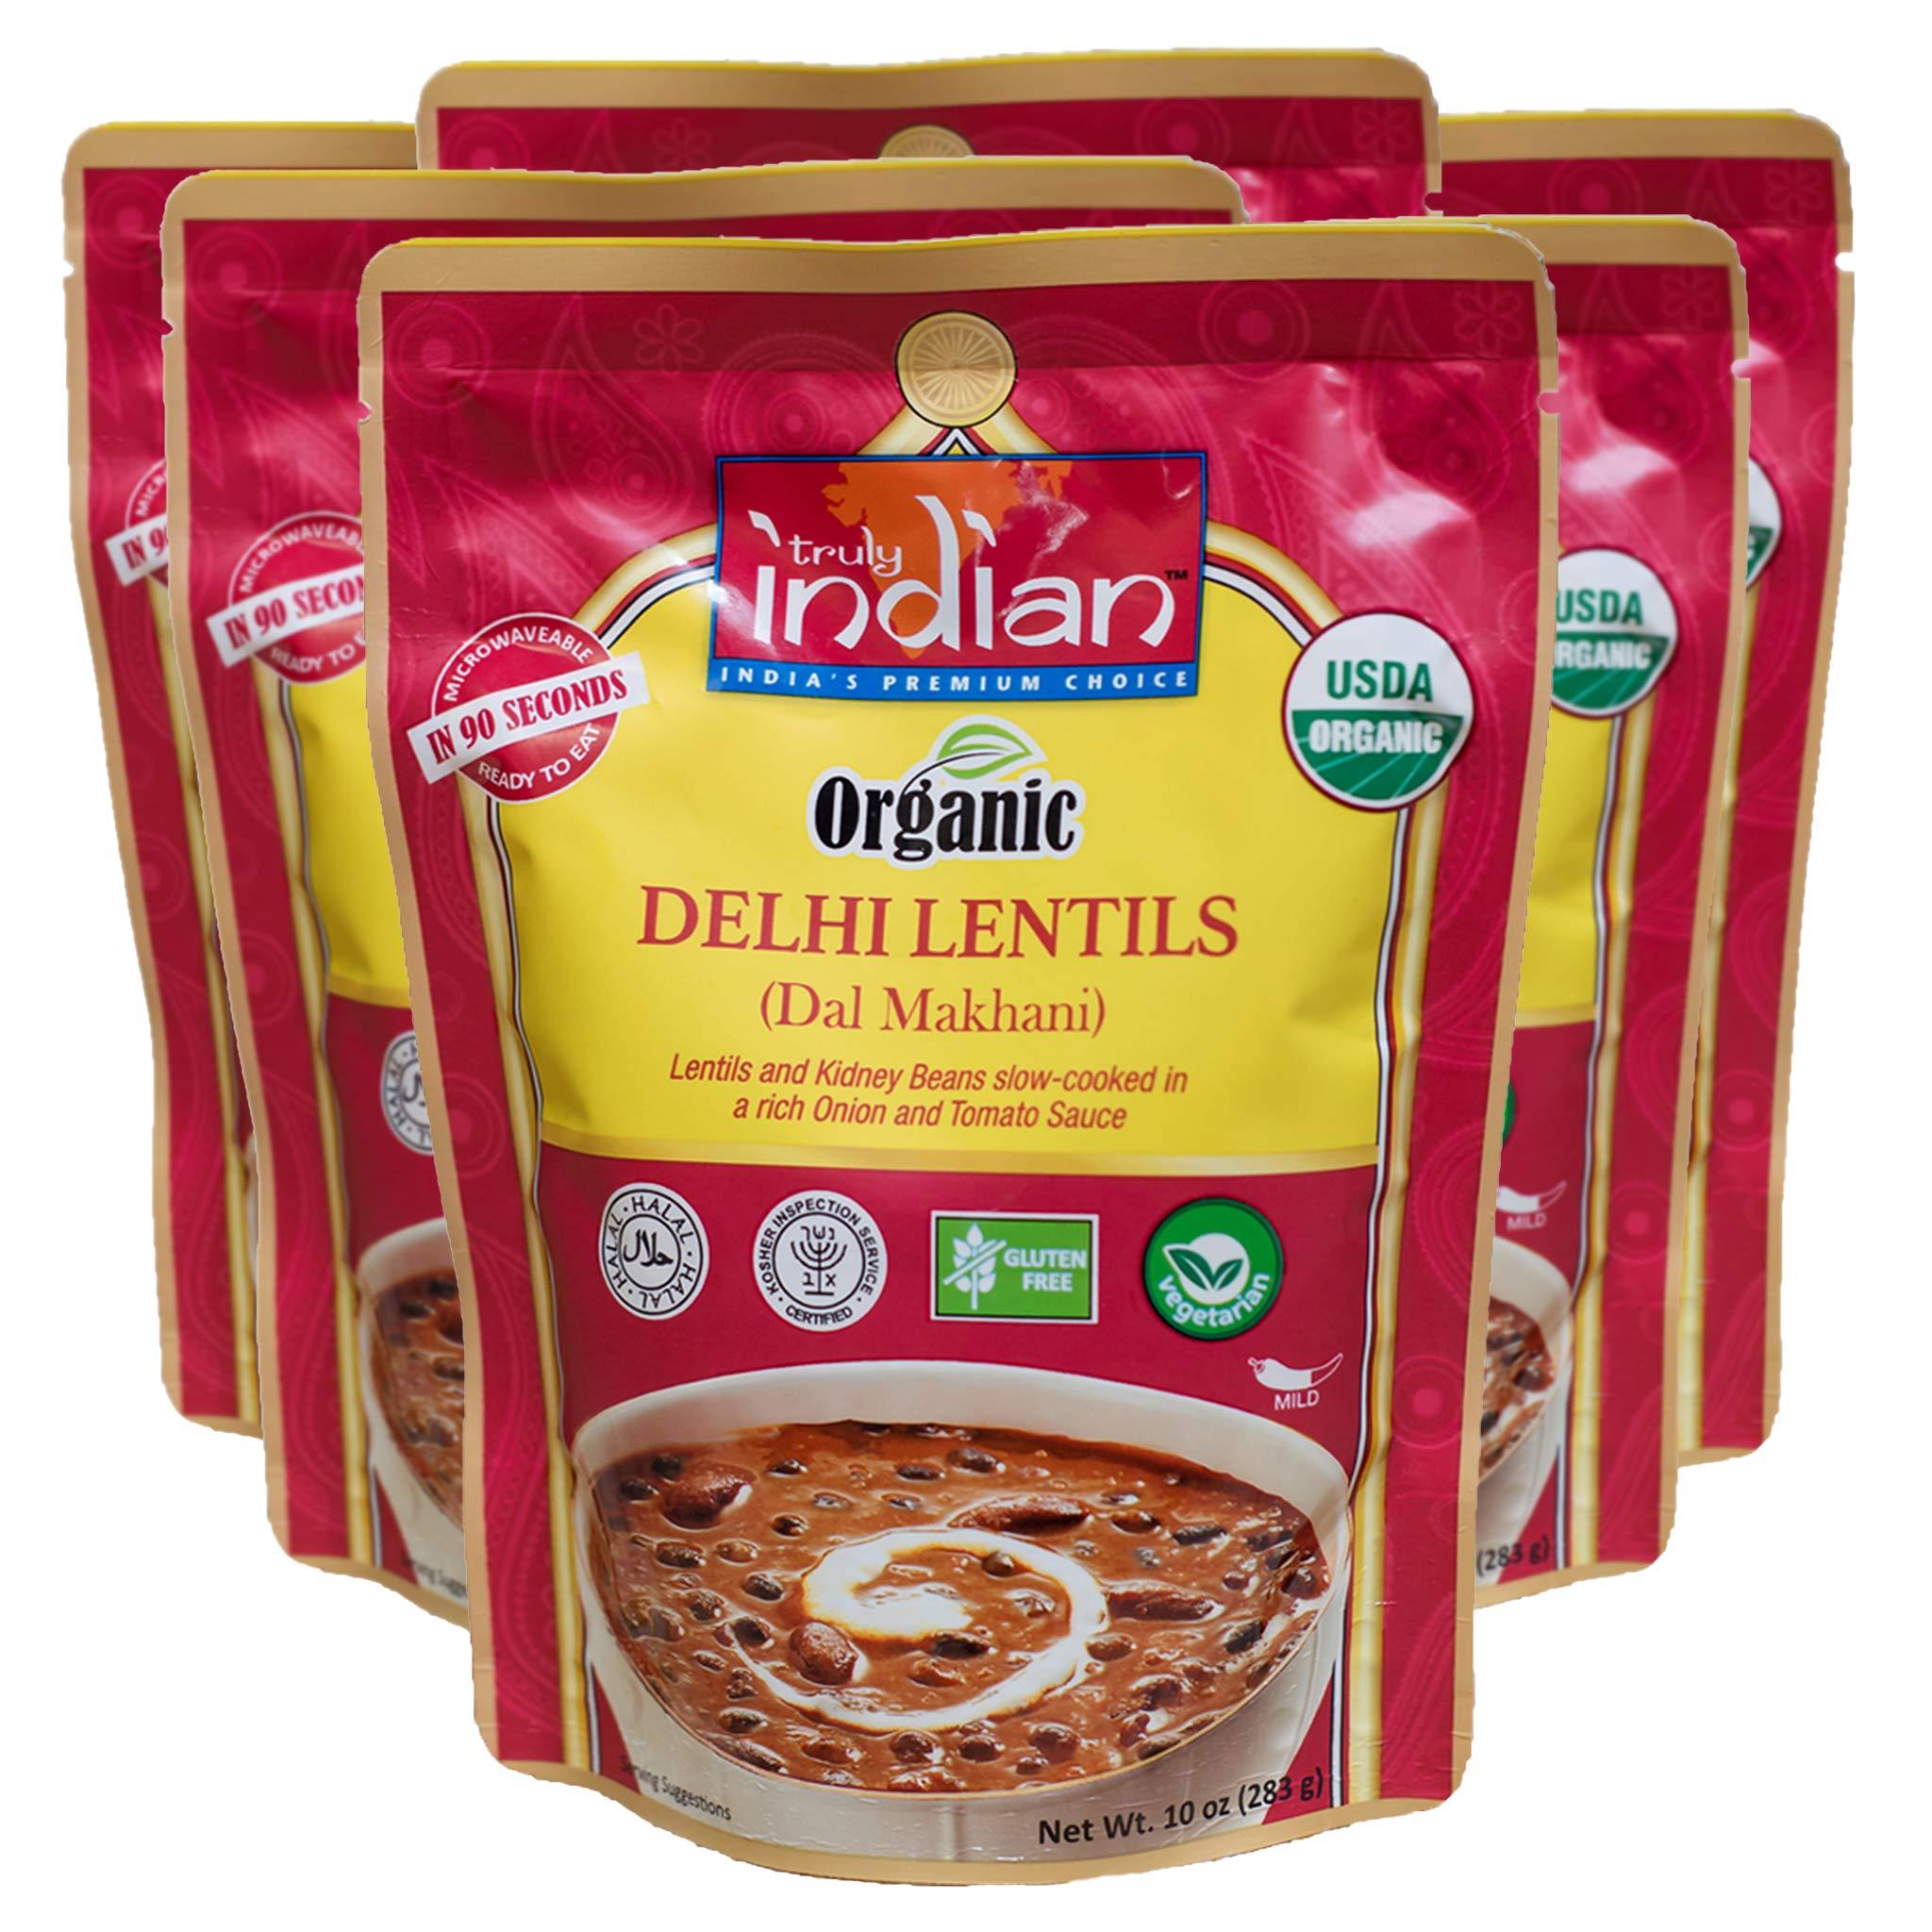 Truly Indian Organic Delhi Lentil, Dal Makhani, Ready-To-Eat, Bold, Flavorful! Halal, Kosher, Gluten-Free, Vegan and Vegetarian, 6 pack